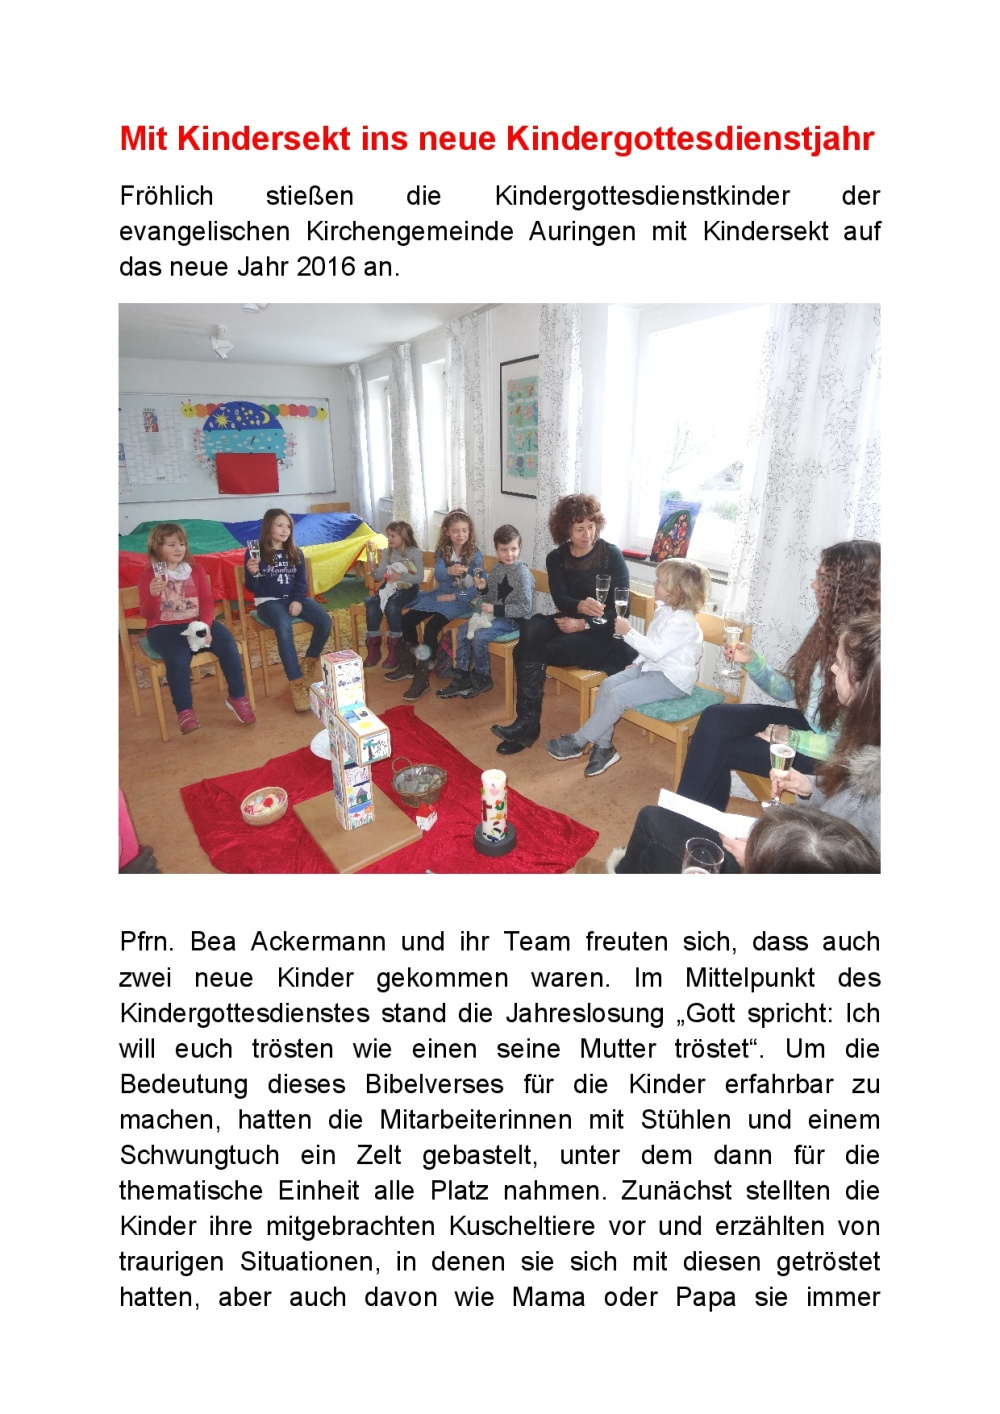 2016-01-17-mit-kindersekt-ins-neue-kigo-jahr-001